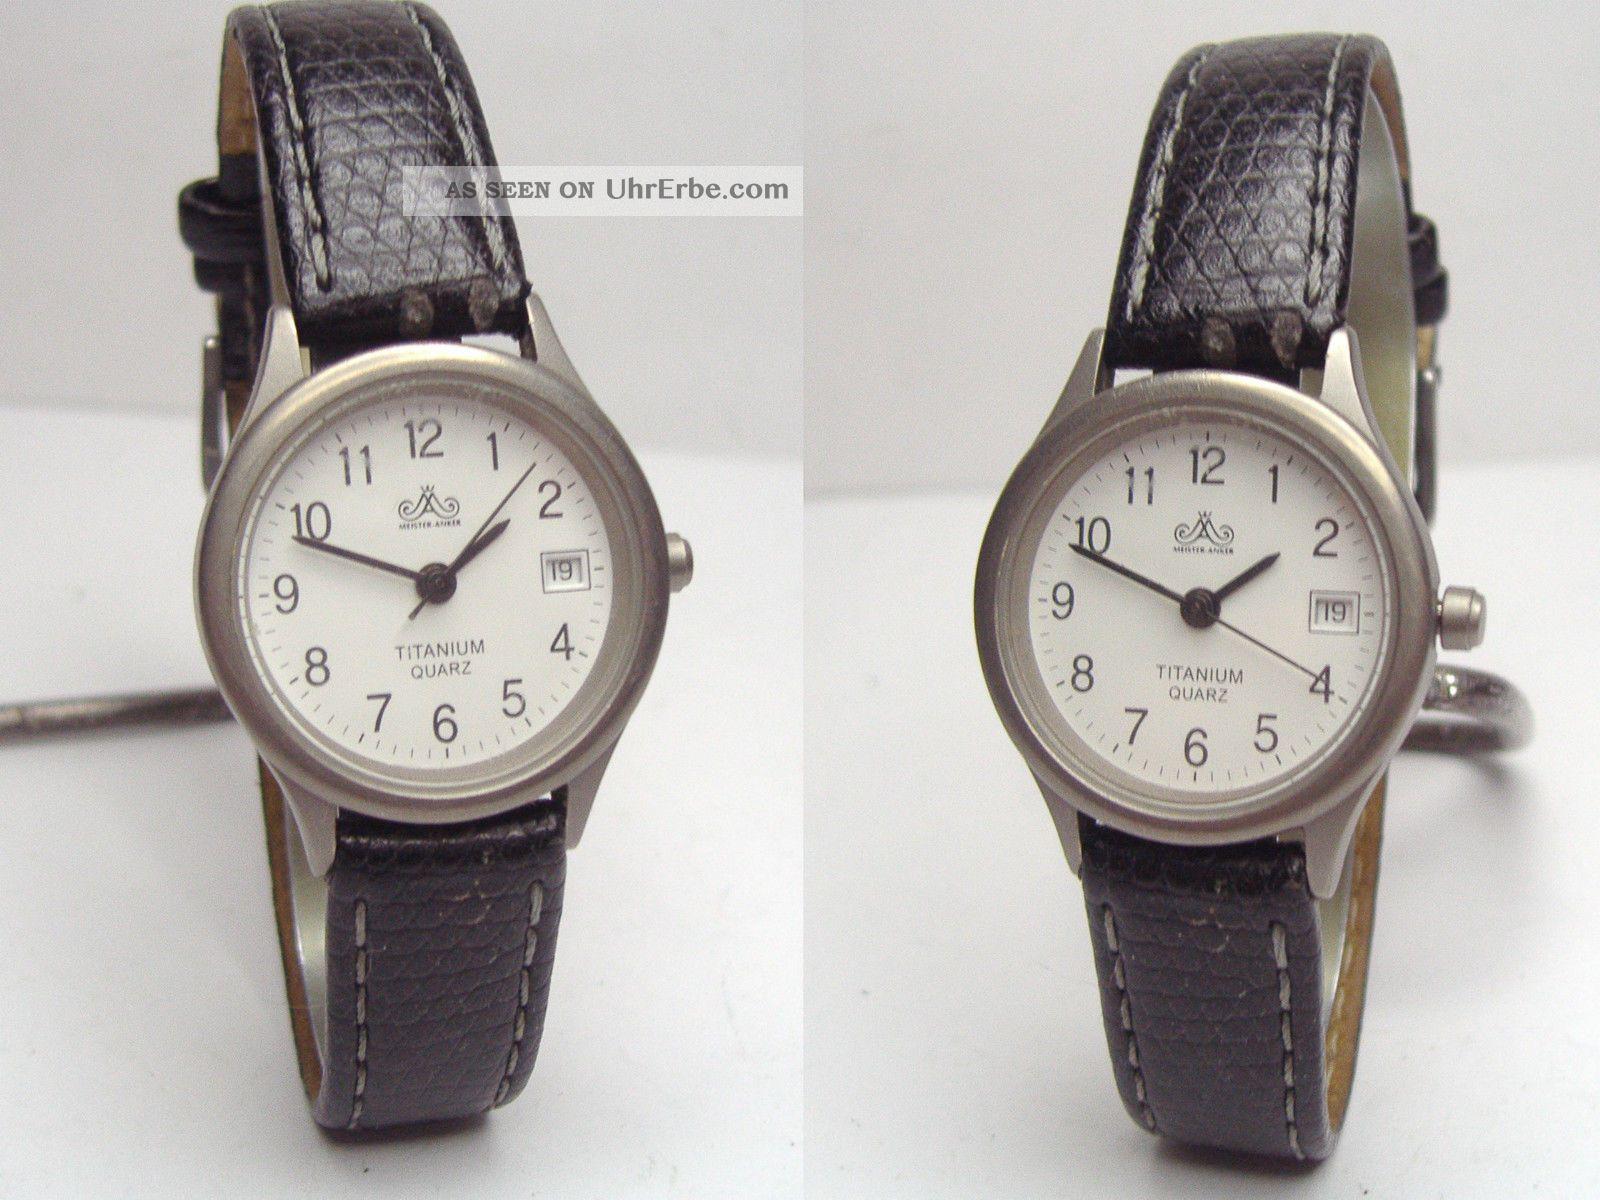 Meister - Anker Titan Damenuhr Mit Datum & Lederband Armbanduhren Bild